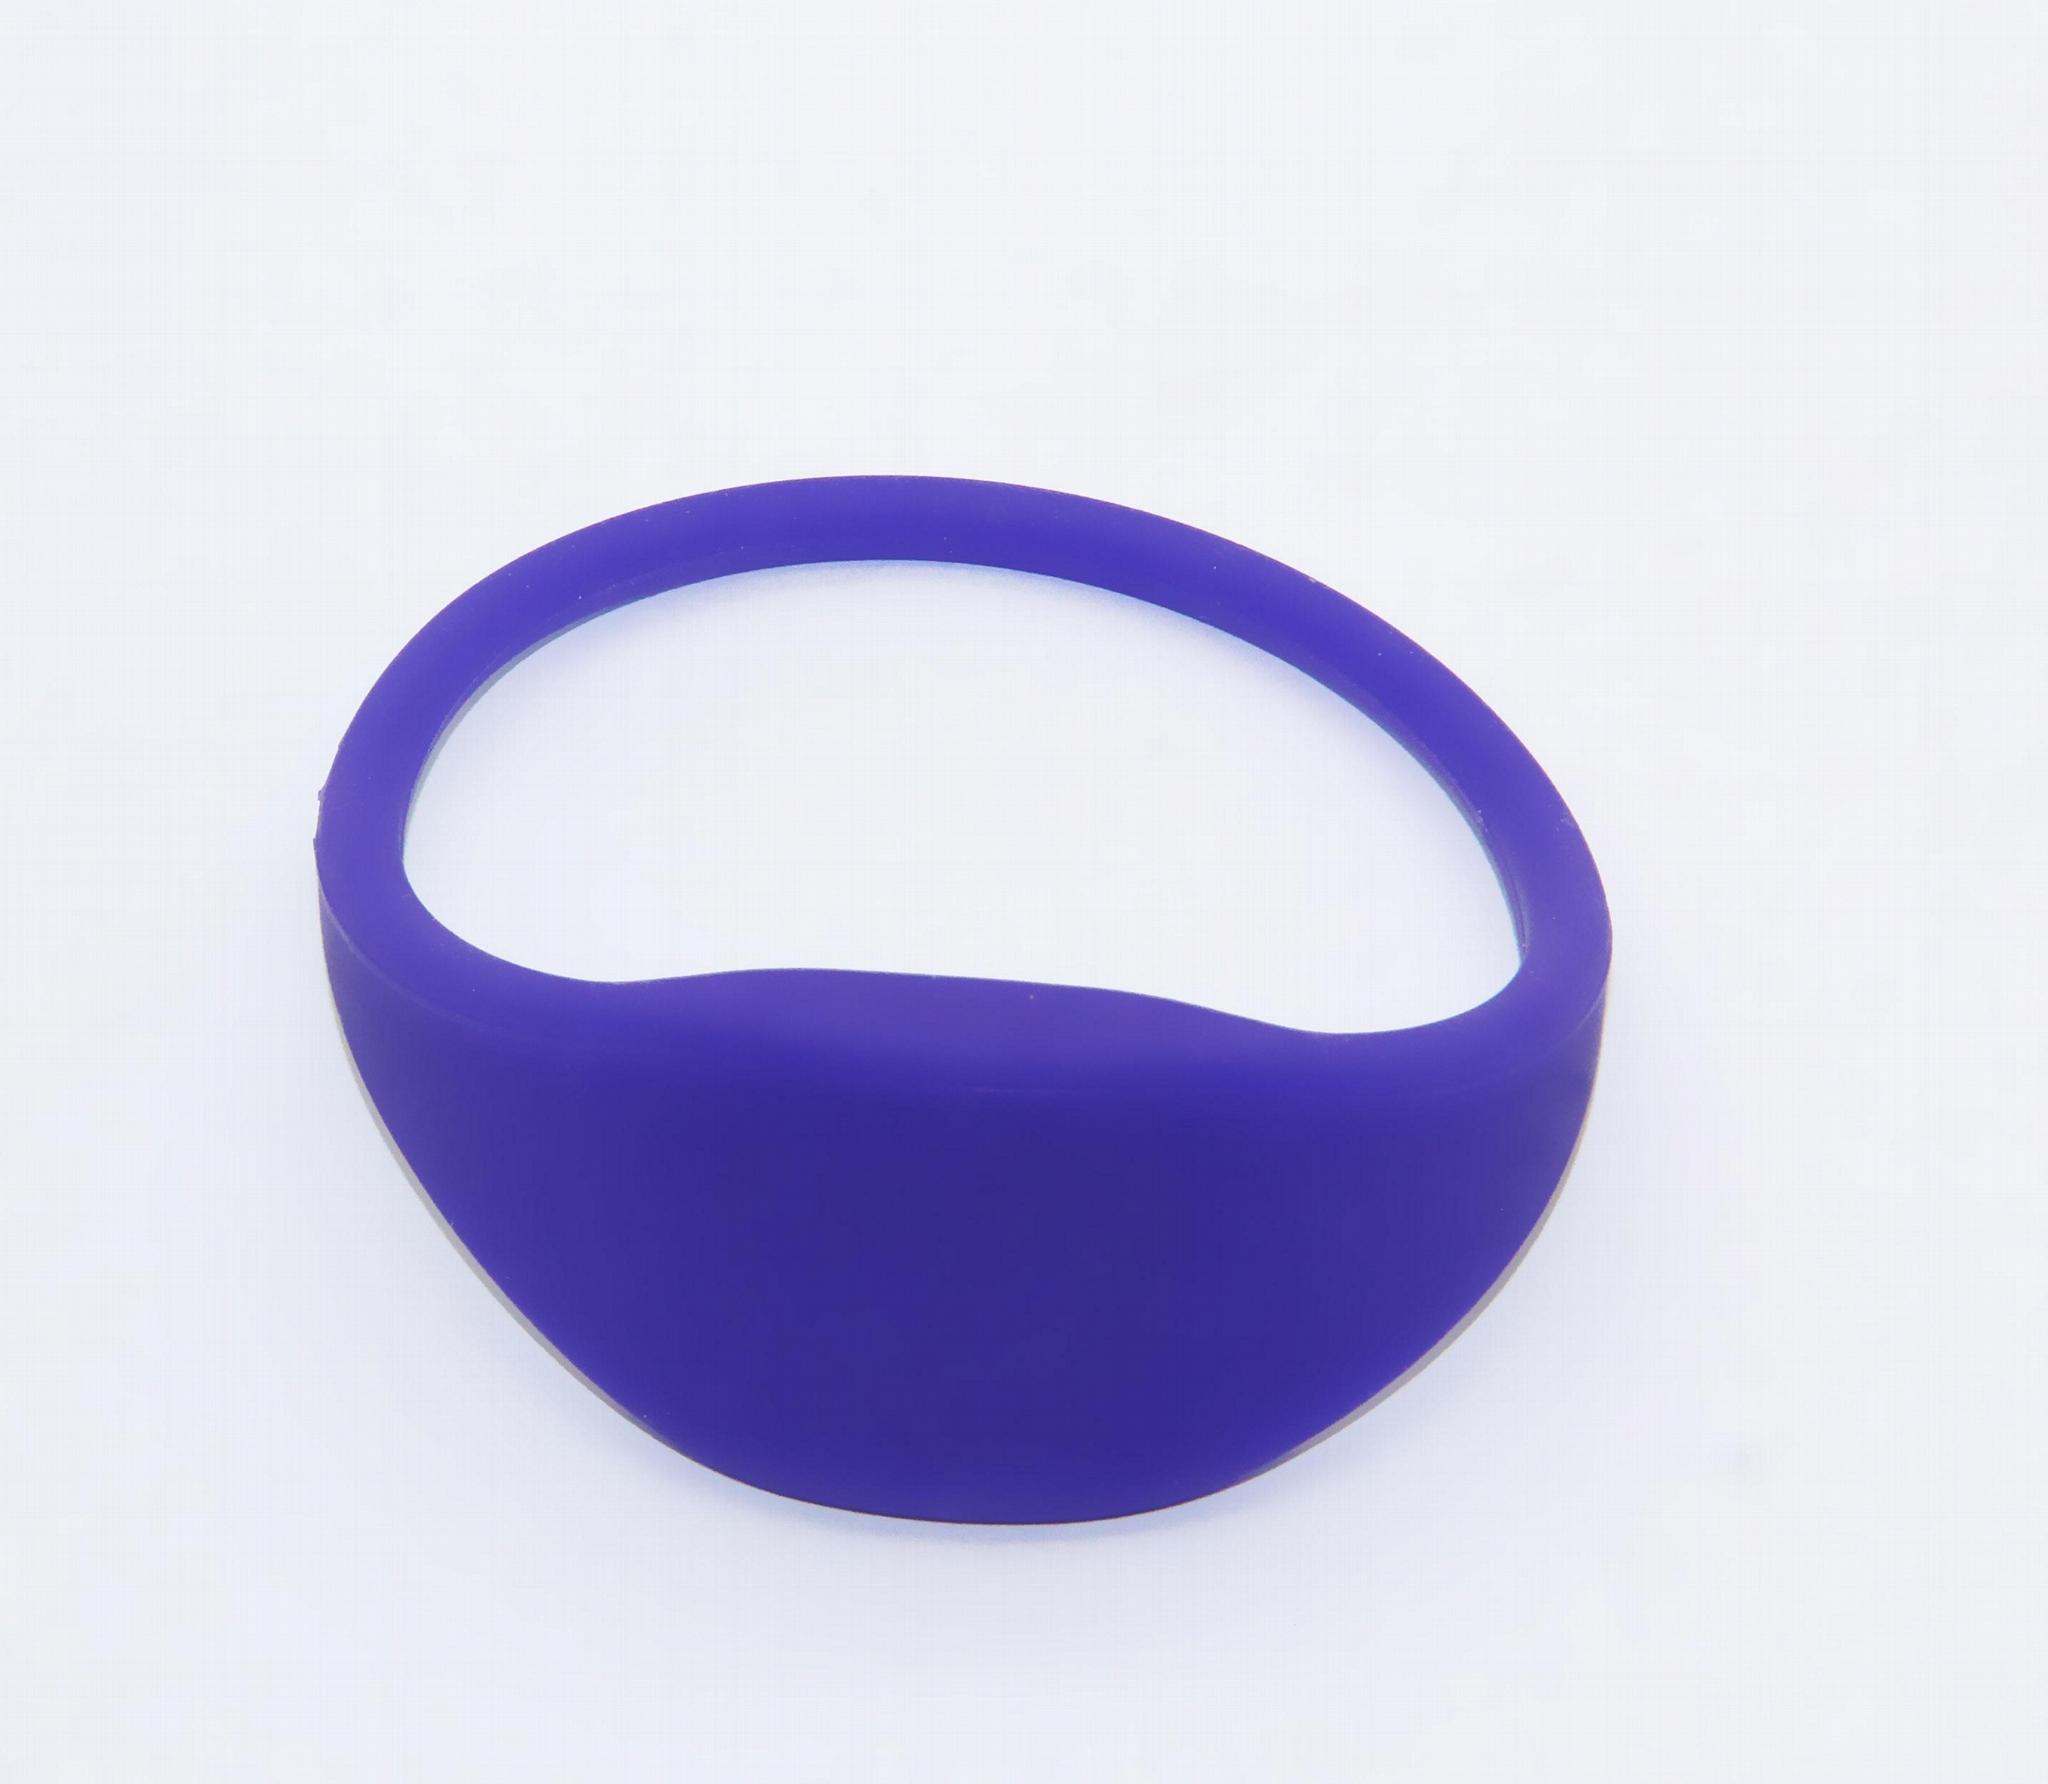 Silicone Soft RFID Bracelet/TK4100 Wristband For Access Control/GYM  3